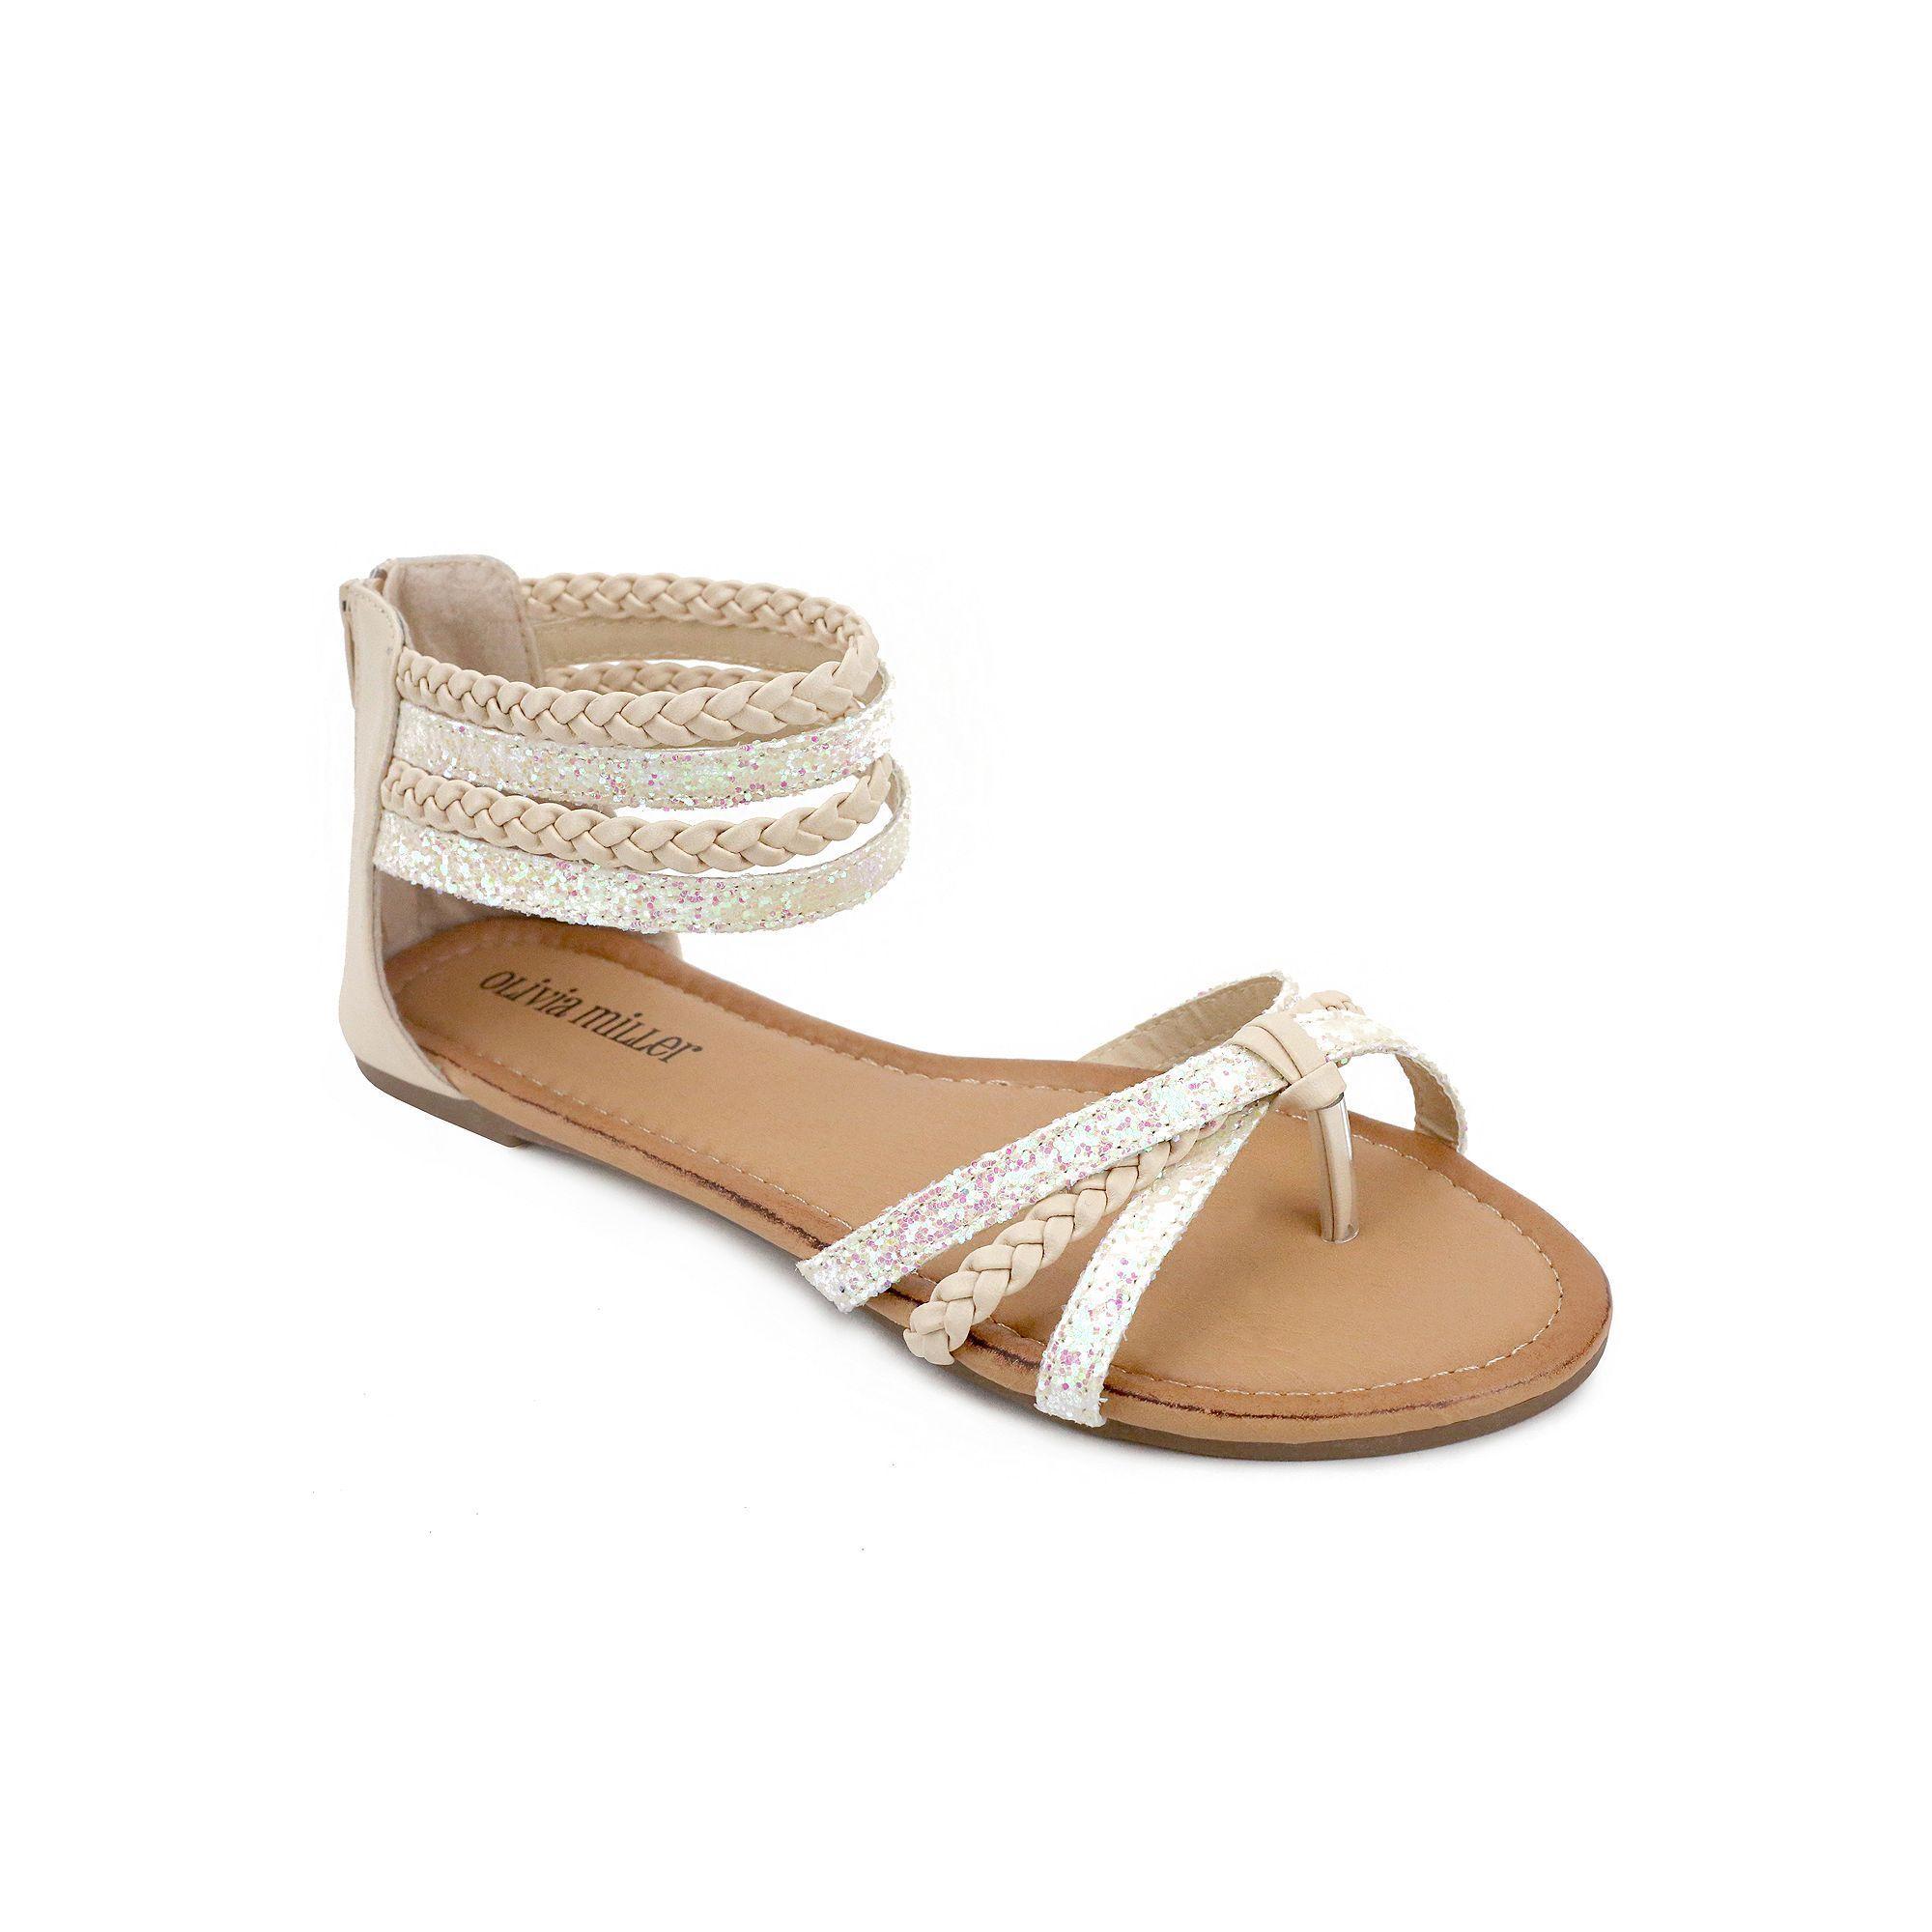 827edce142c7 Olivia Miller Tara Women's Sandals in 2019   Products   Olivia ...